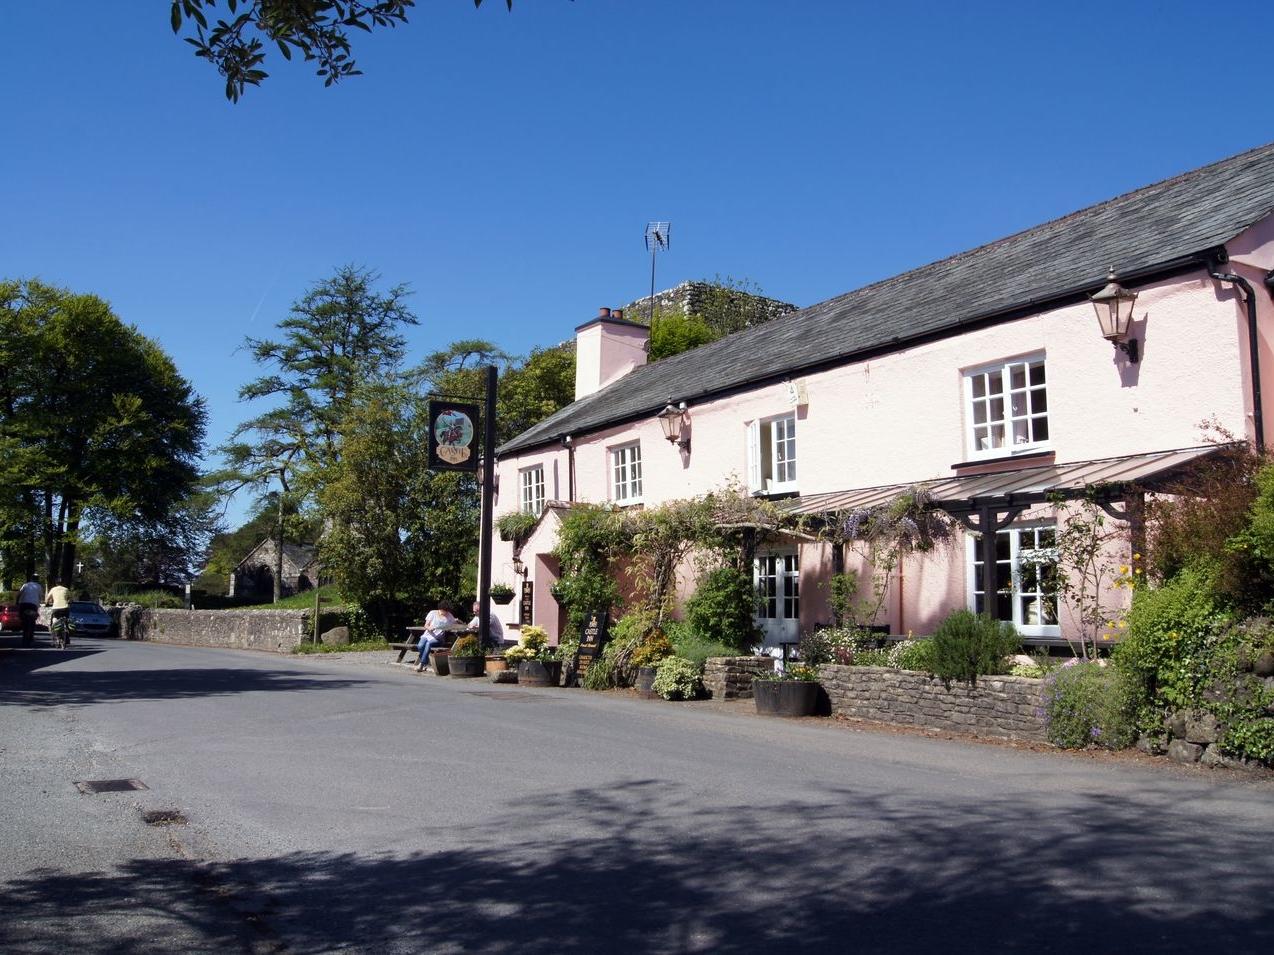 Lot Cottage